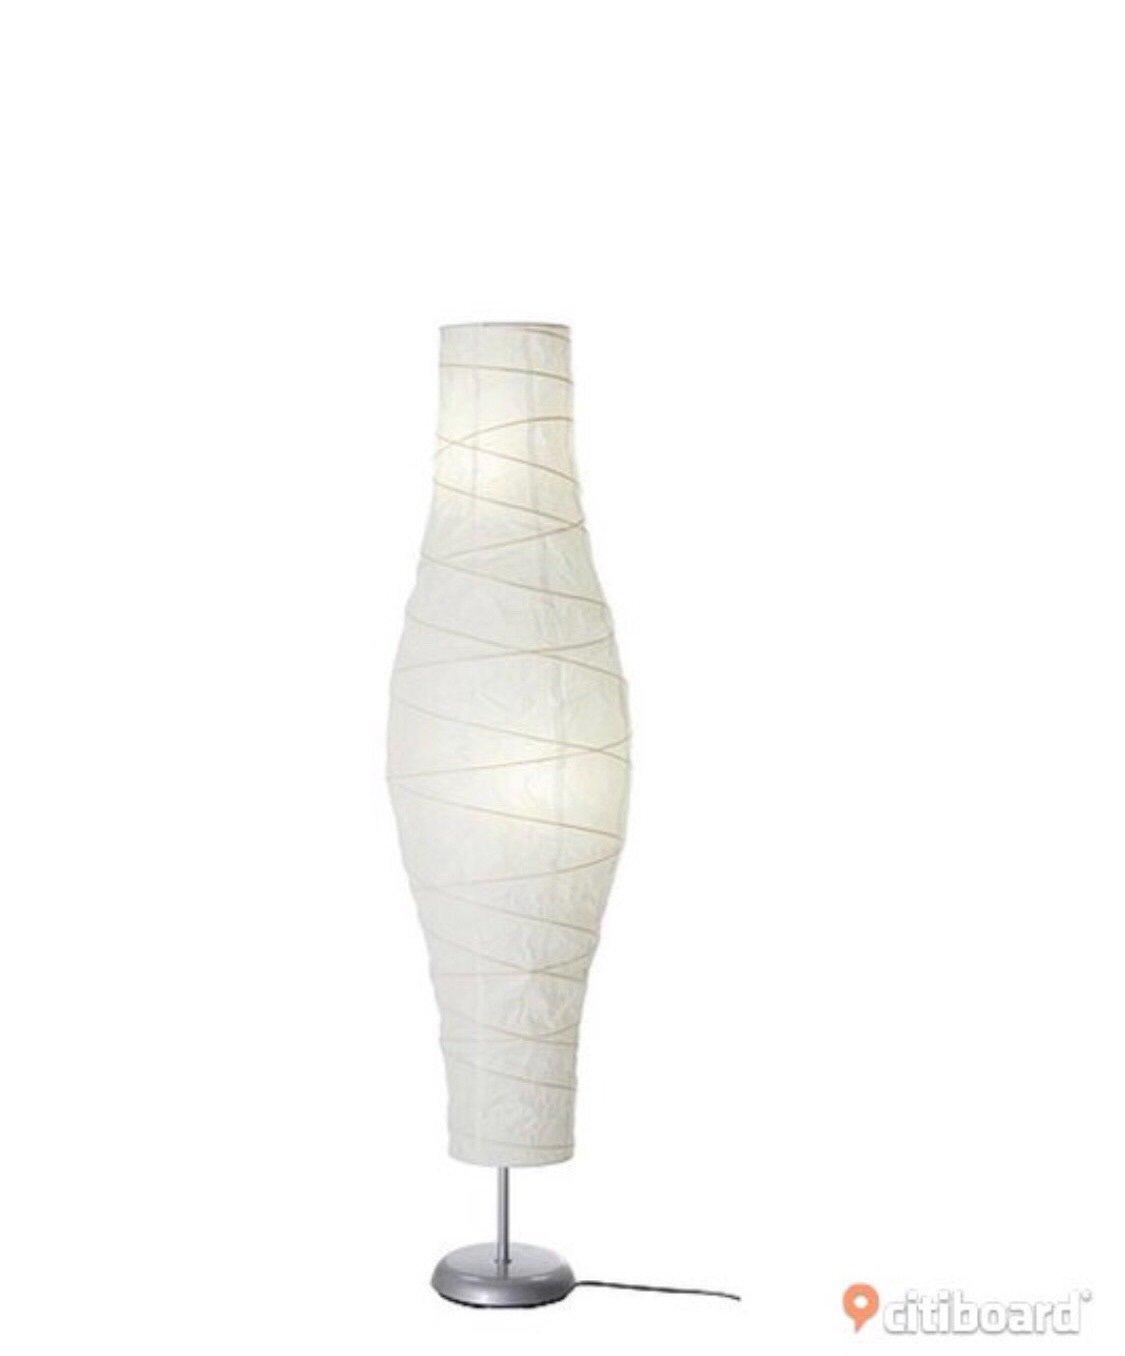 Lampa från Ikea